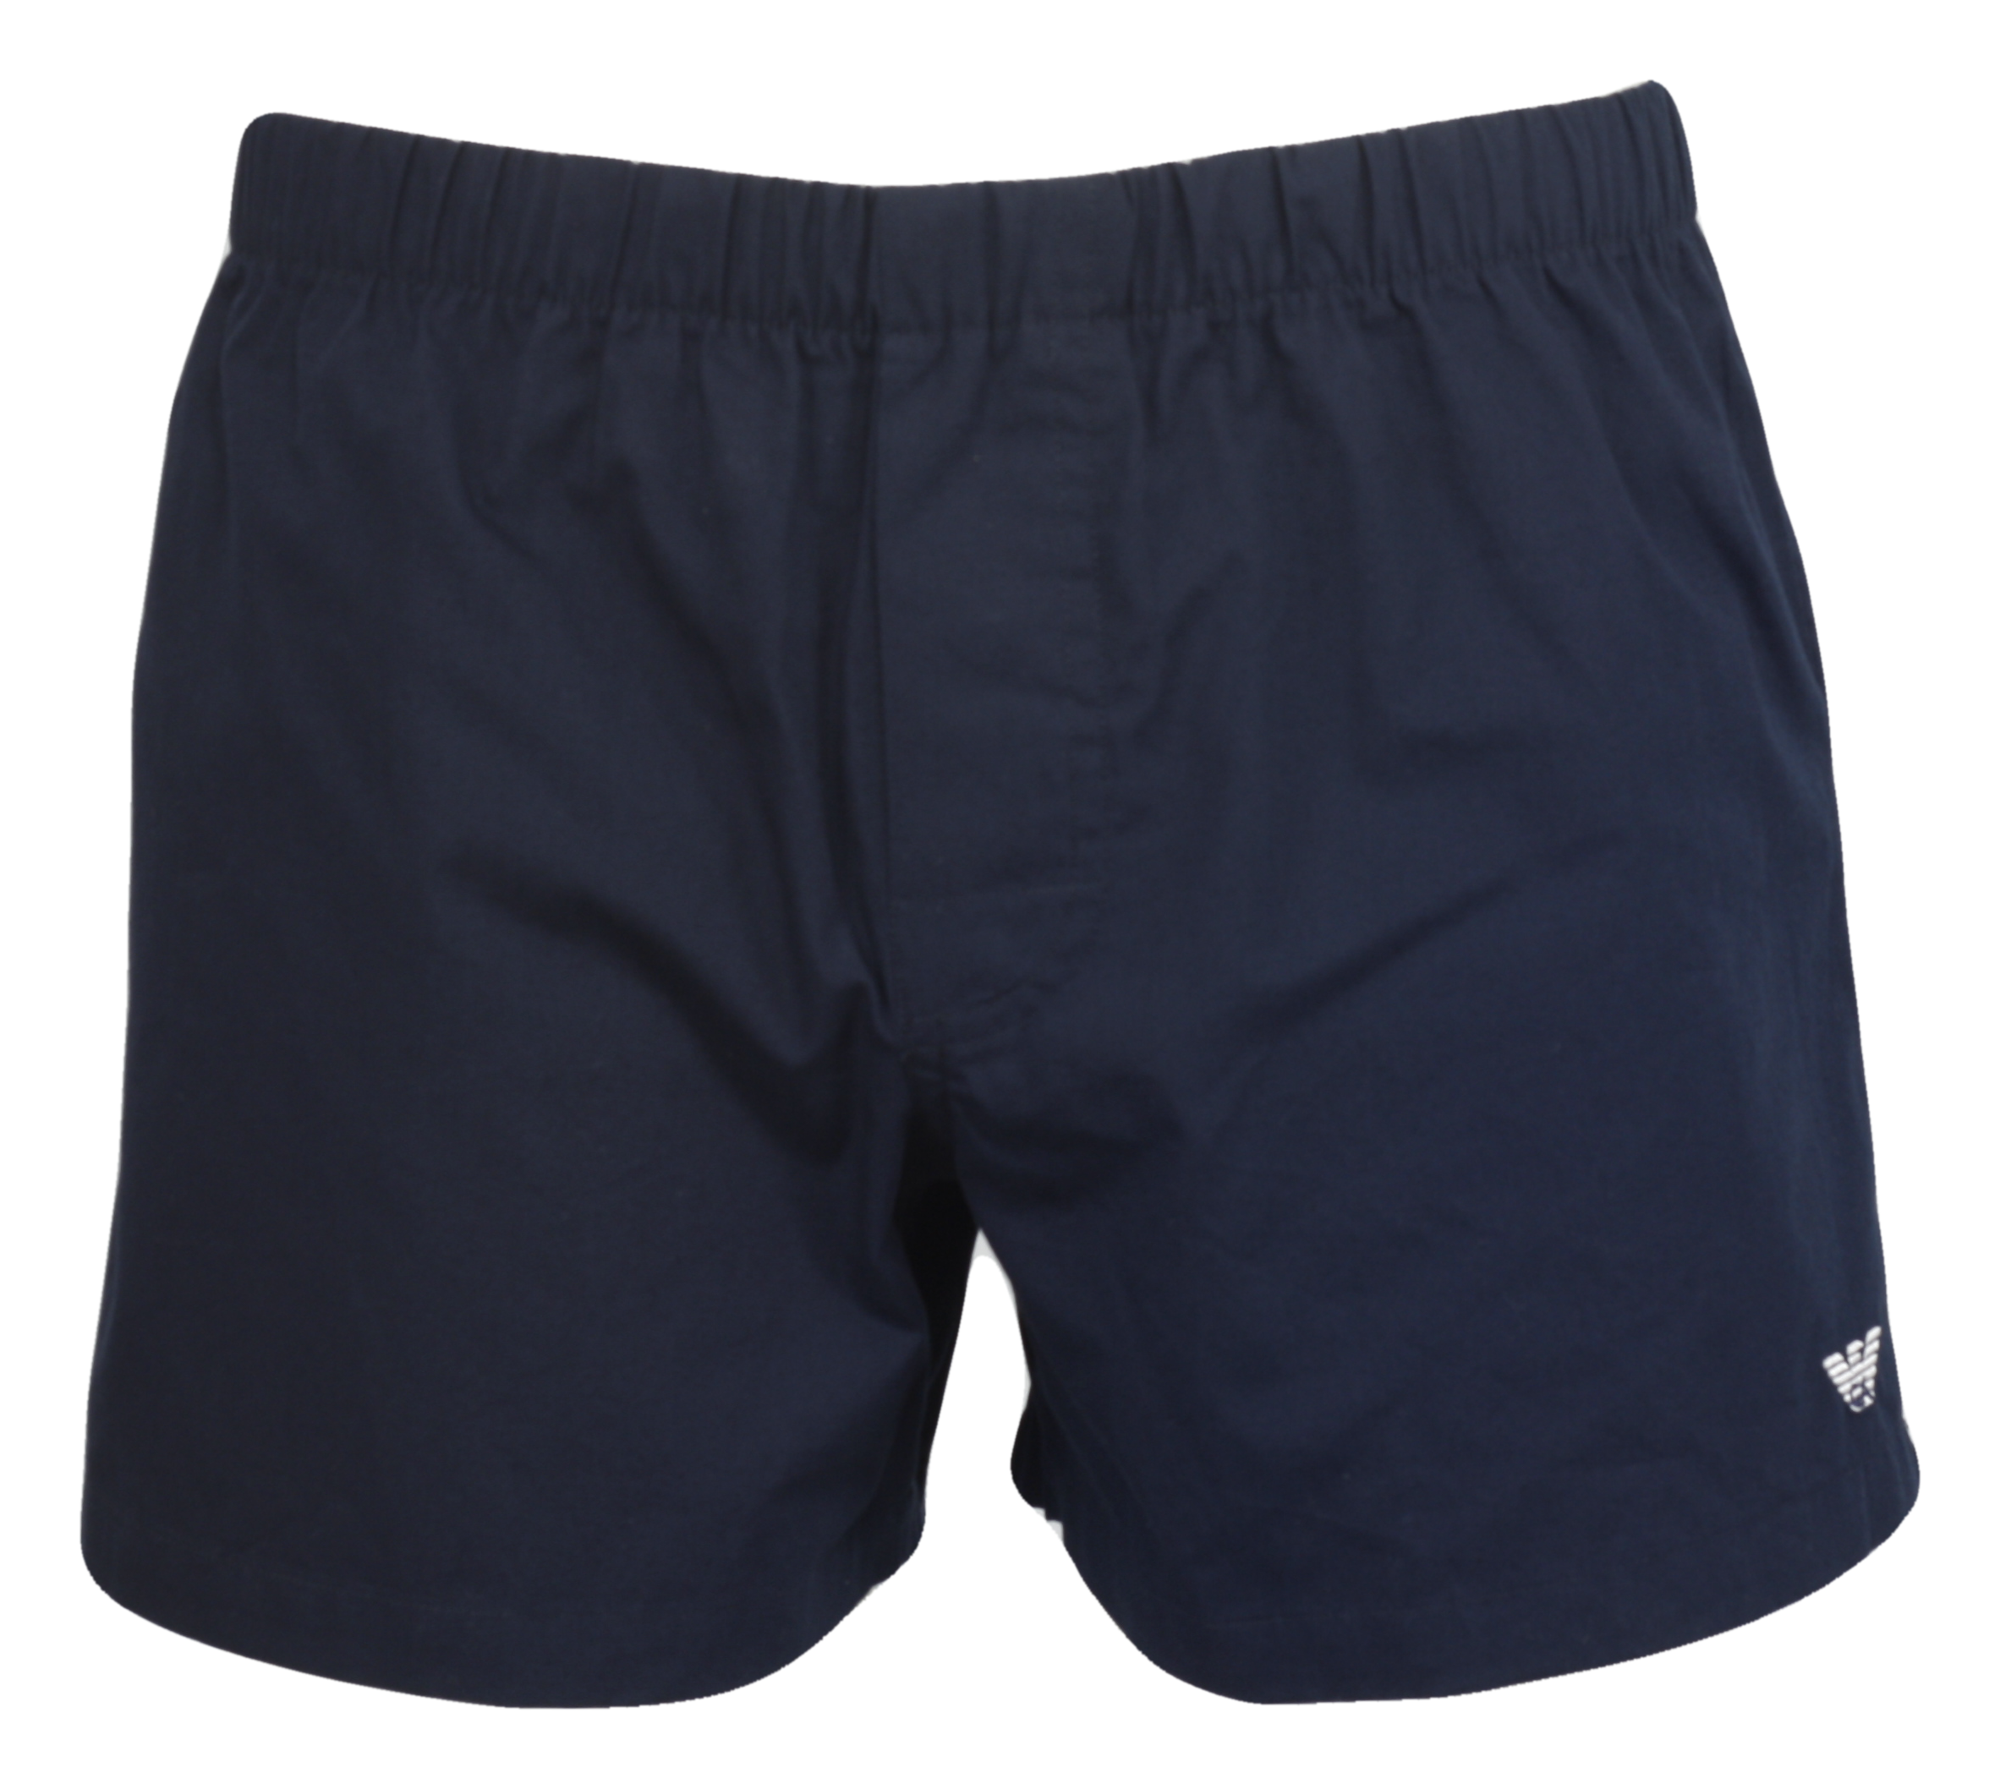 Pánské boxerky 9S575 - Emporio Armani Barva: modrá, Velikost: S